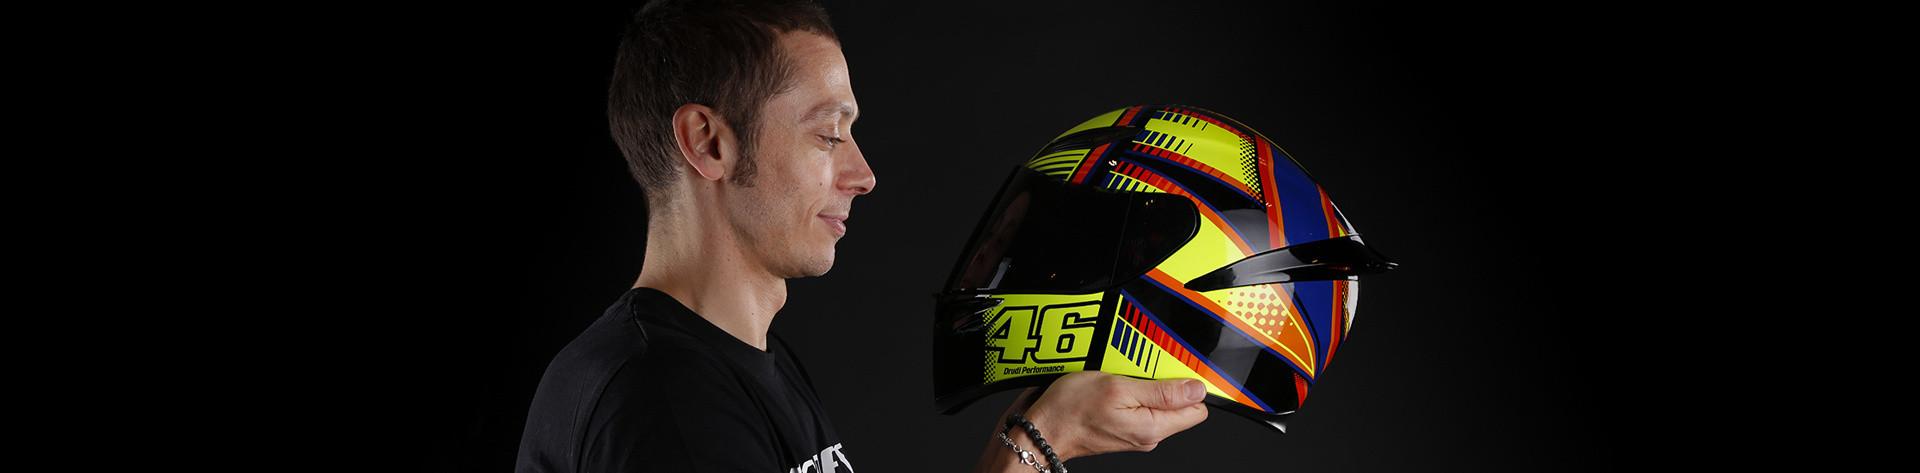 K1 Full Face Helmets Agv Motorcycle Helmets Official Website